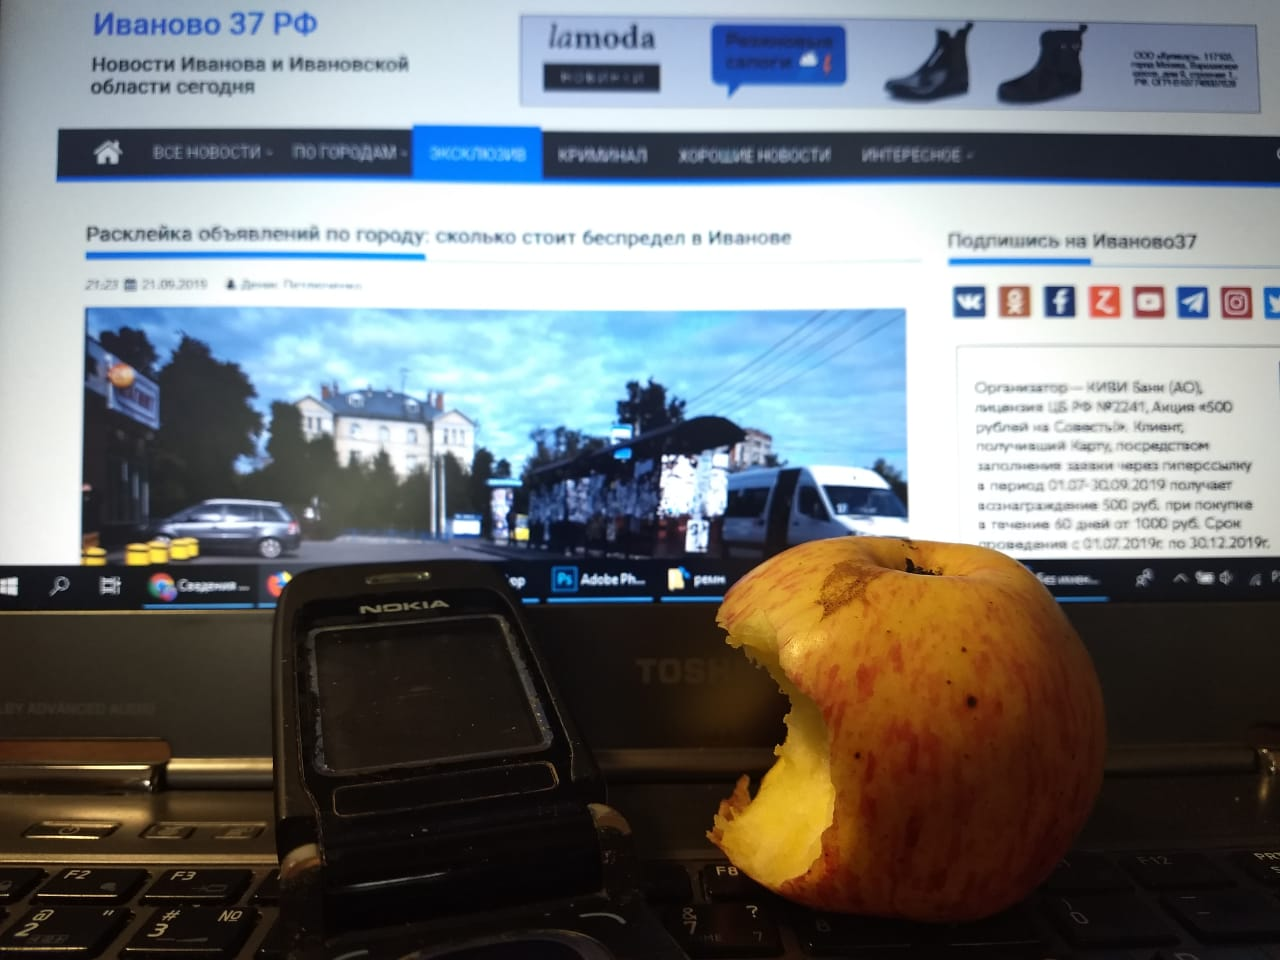 Чиновники Иванова за госбюджет покупают iPhone XS Max 512ГБ